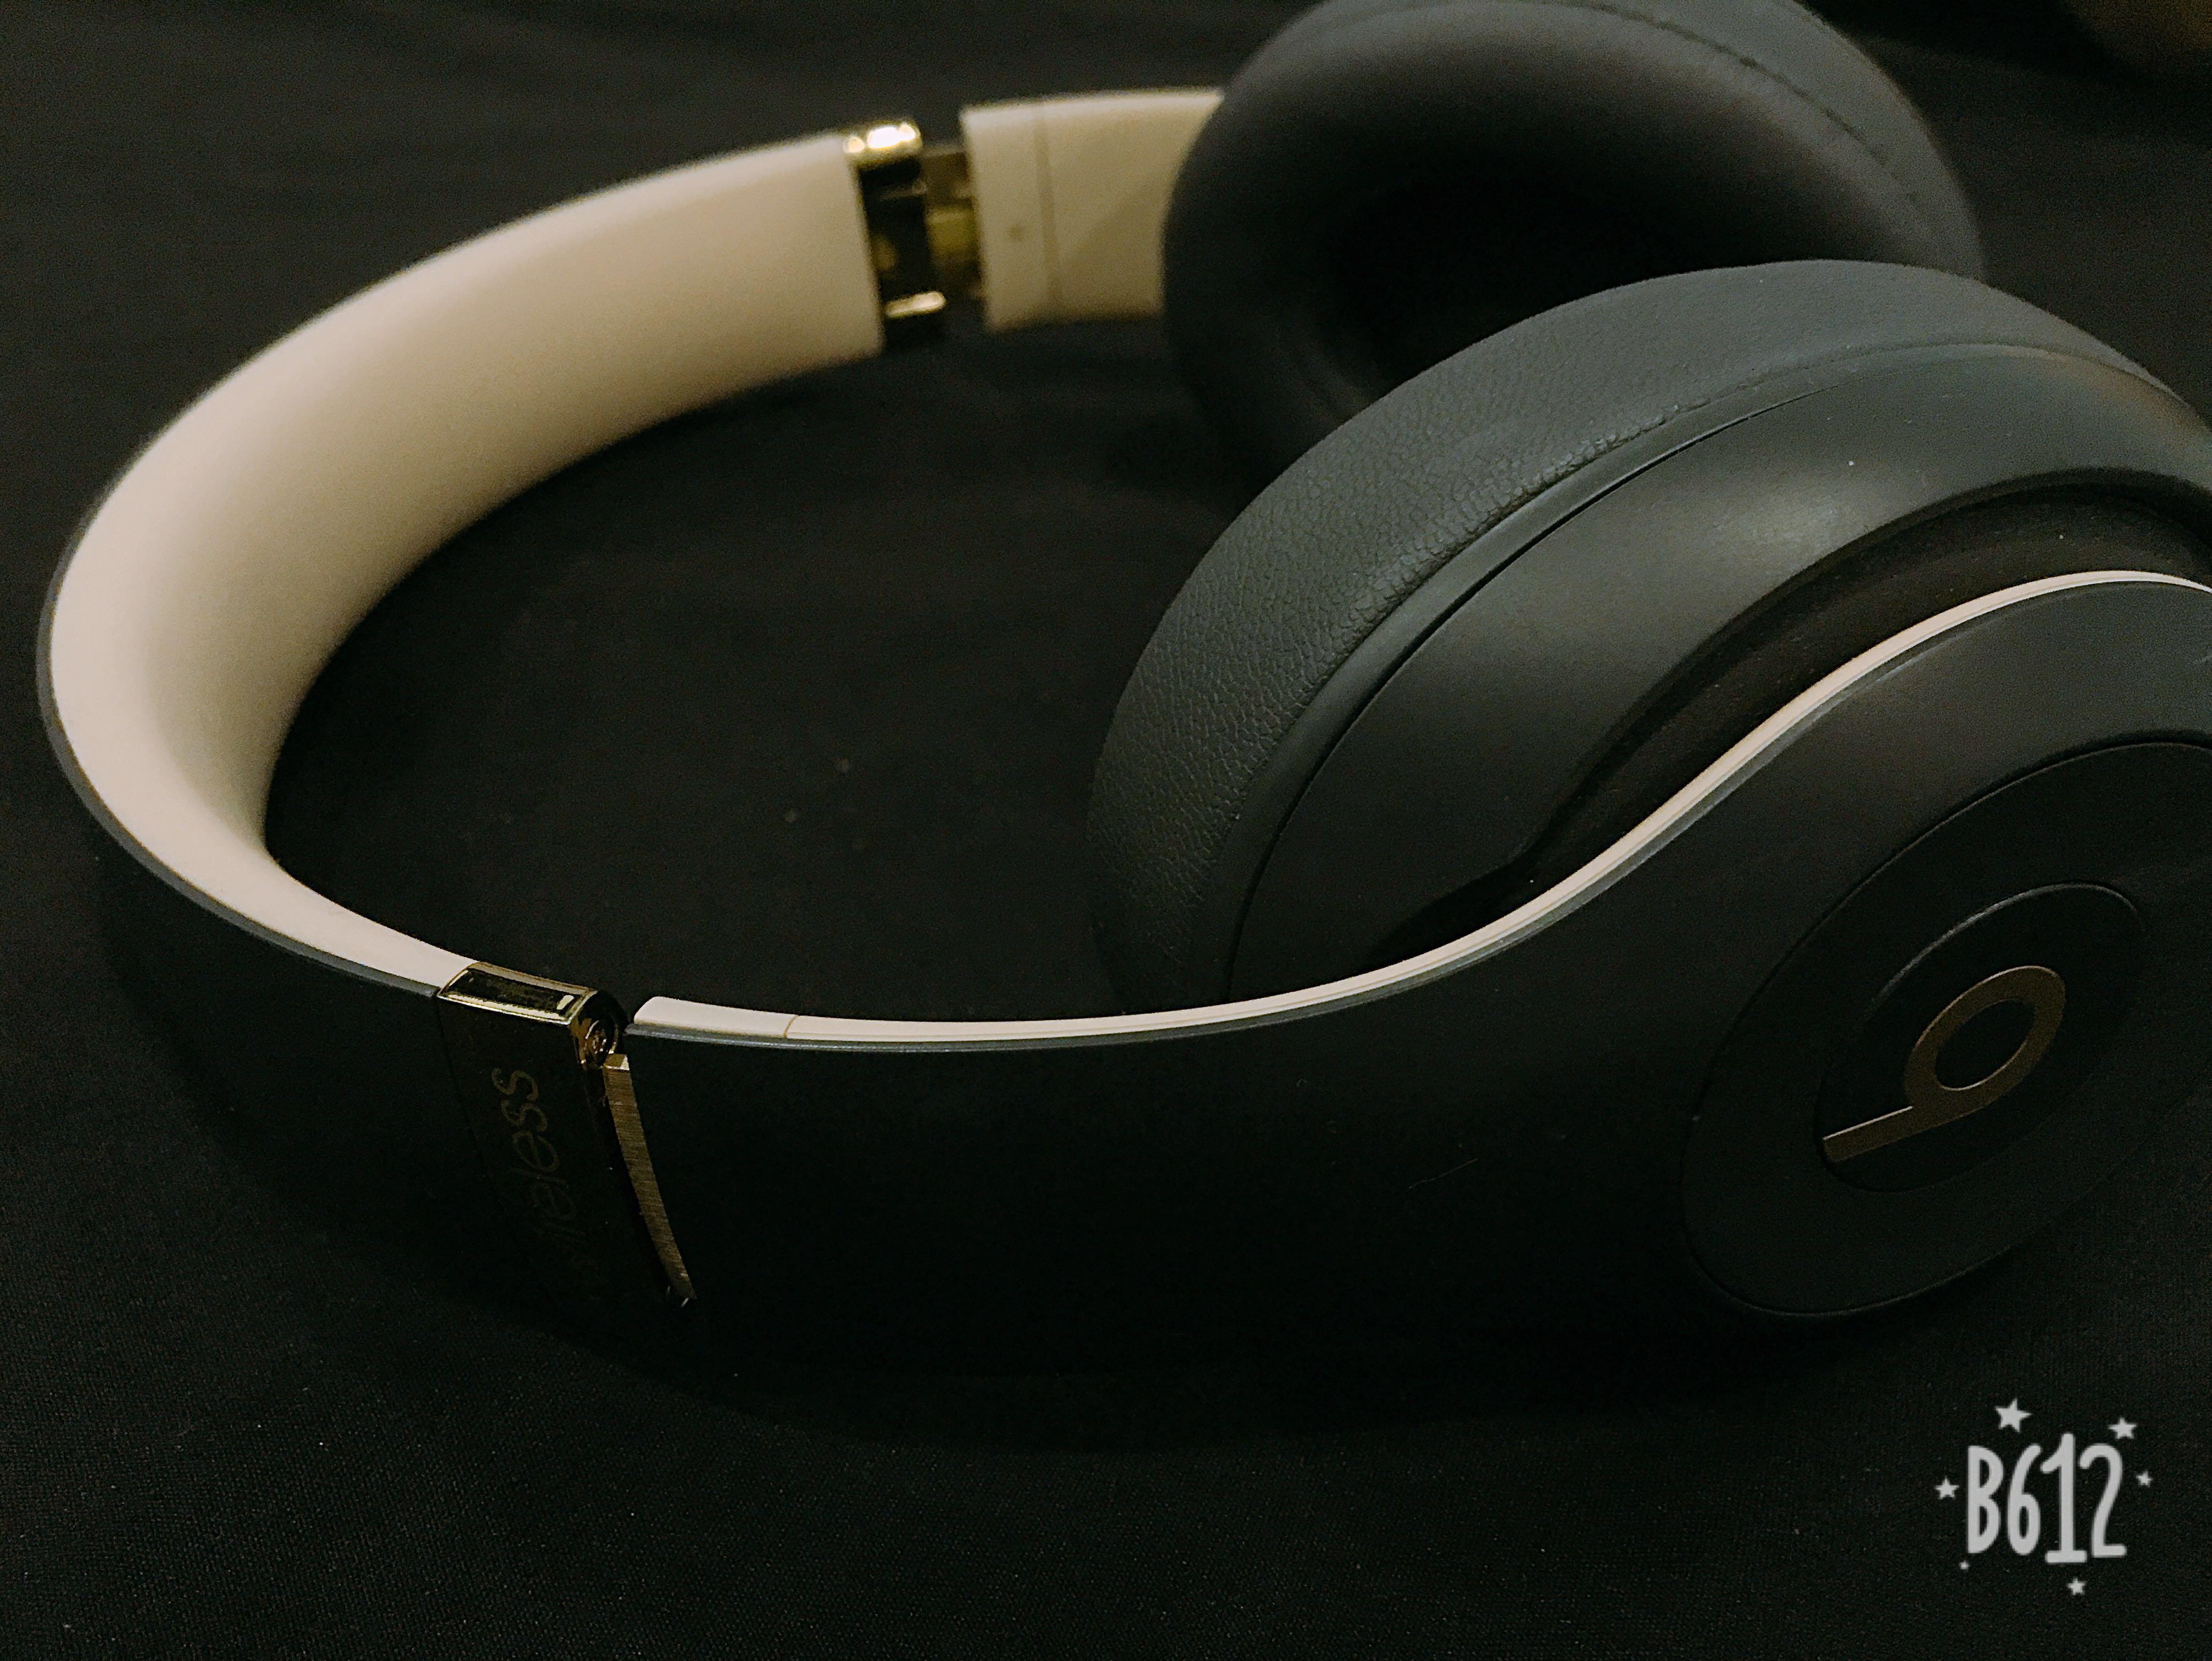 d92b2c07f4f Beats studio 3 wireless overear headphone - shadow grey, Electronics ...